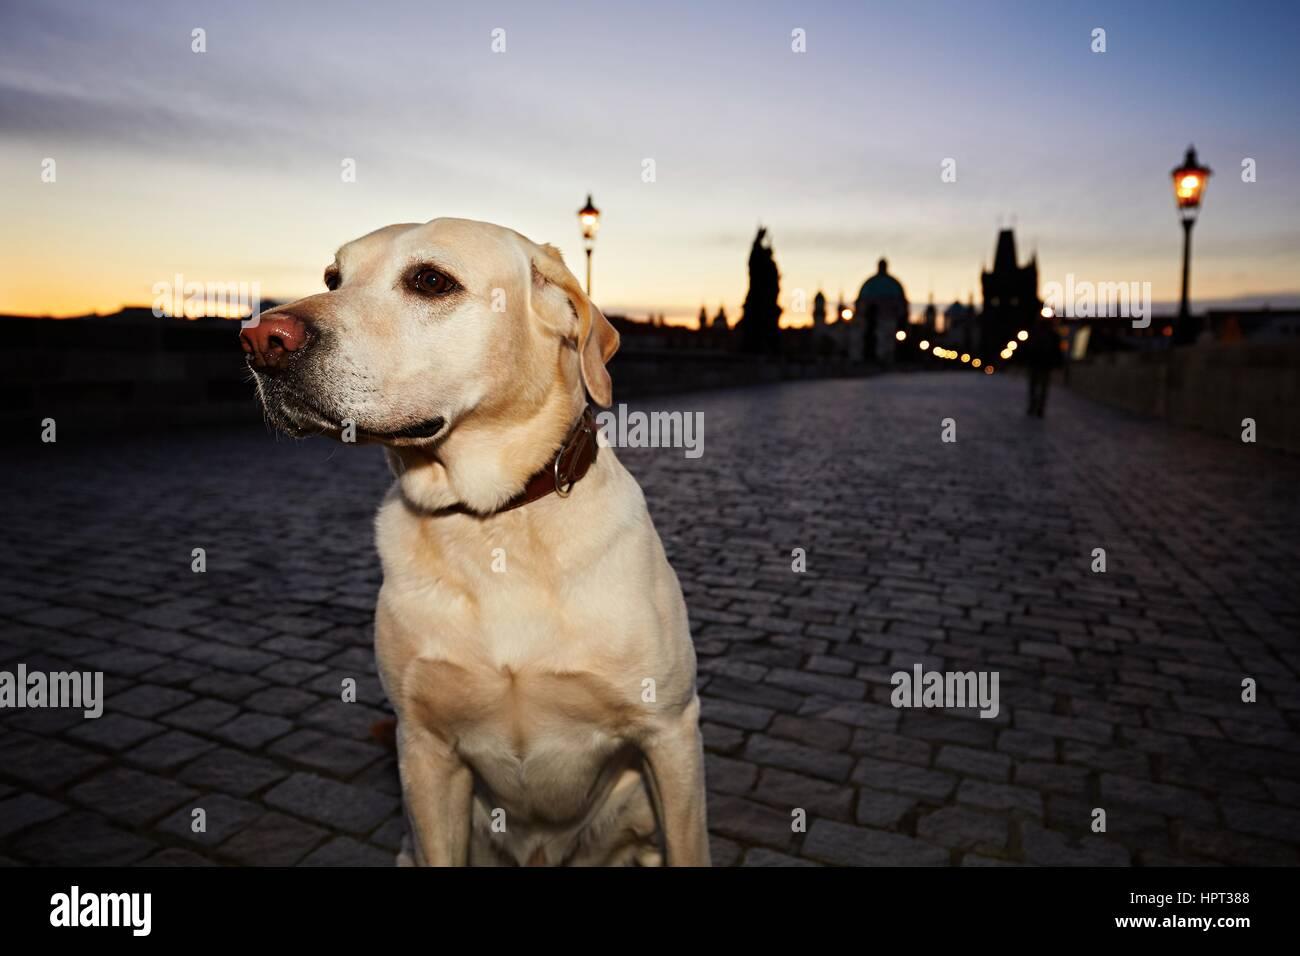 Labrador retriever on the Charles Bridge in Prague at the sunrise. - Stock Image